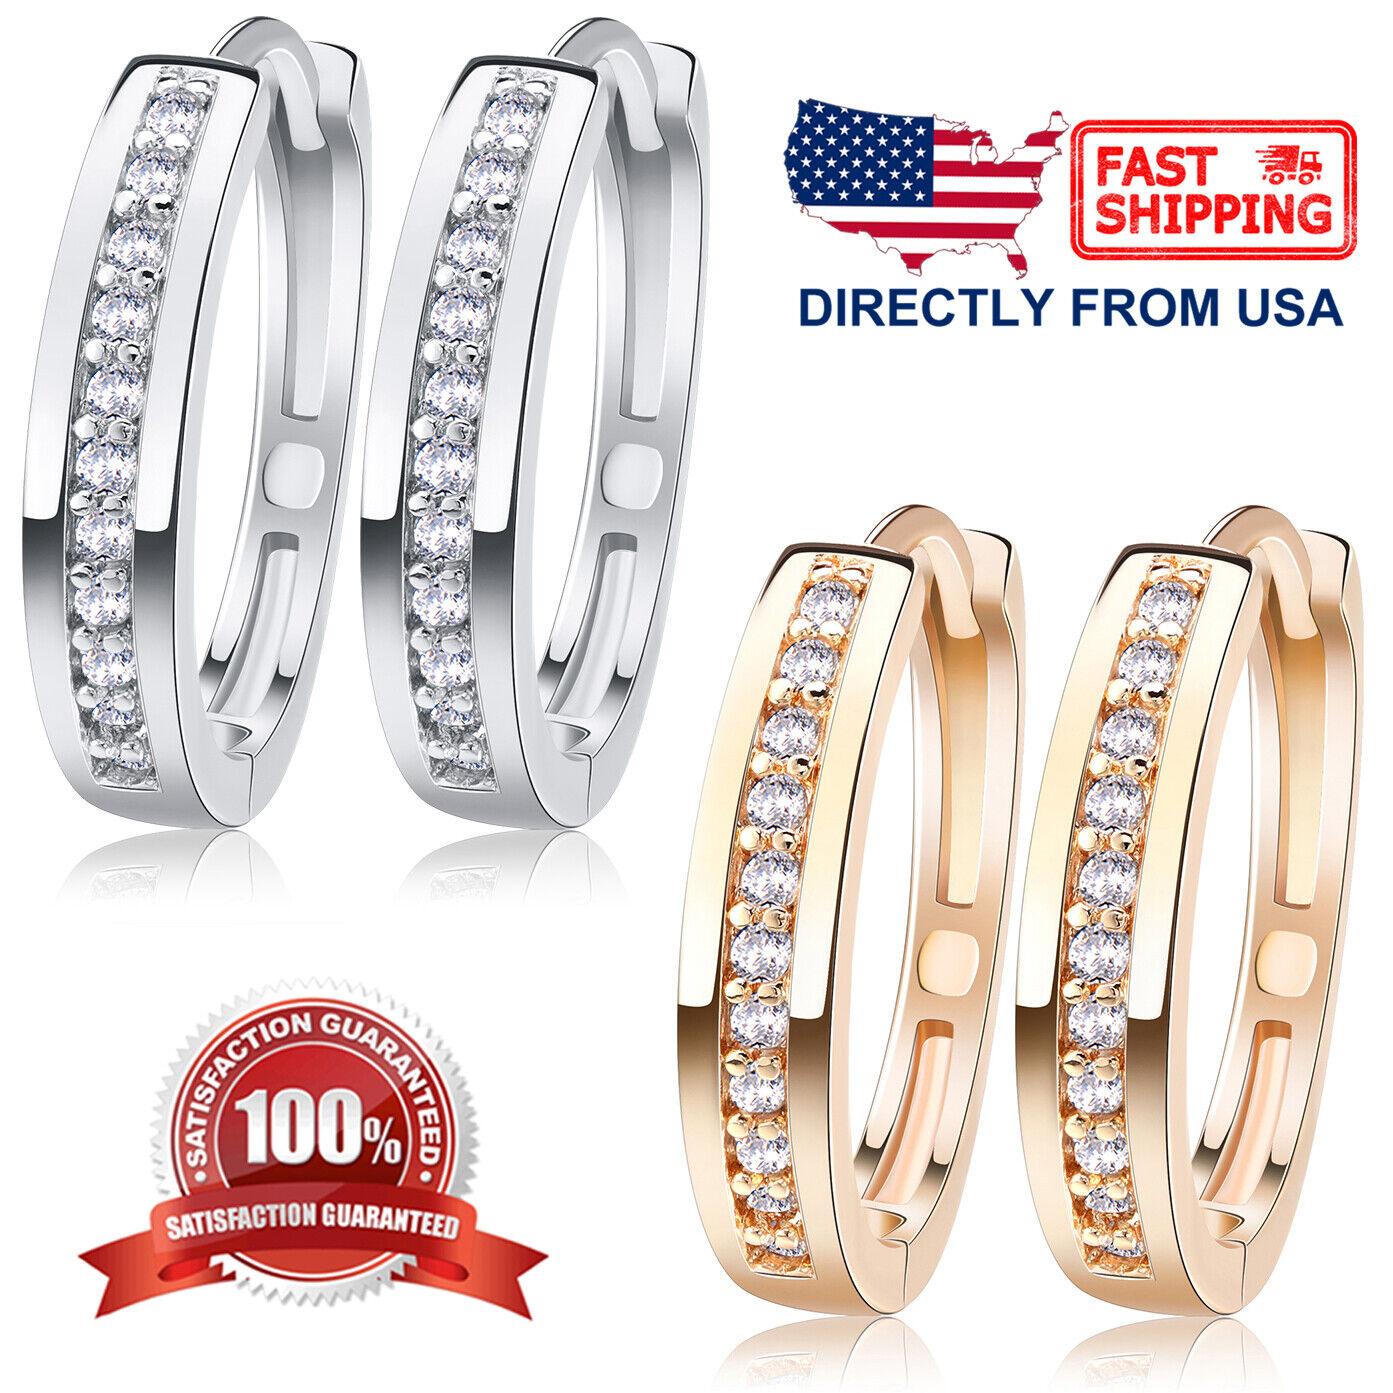 Women's Cubic Zirconia Silver or Rose Gold Color Stainless Steel Huggie Earrings Earrings